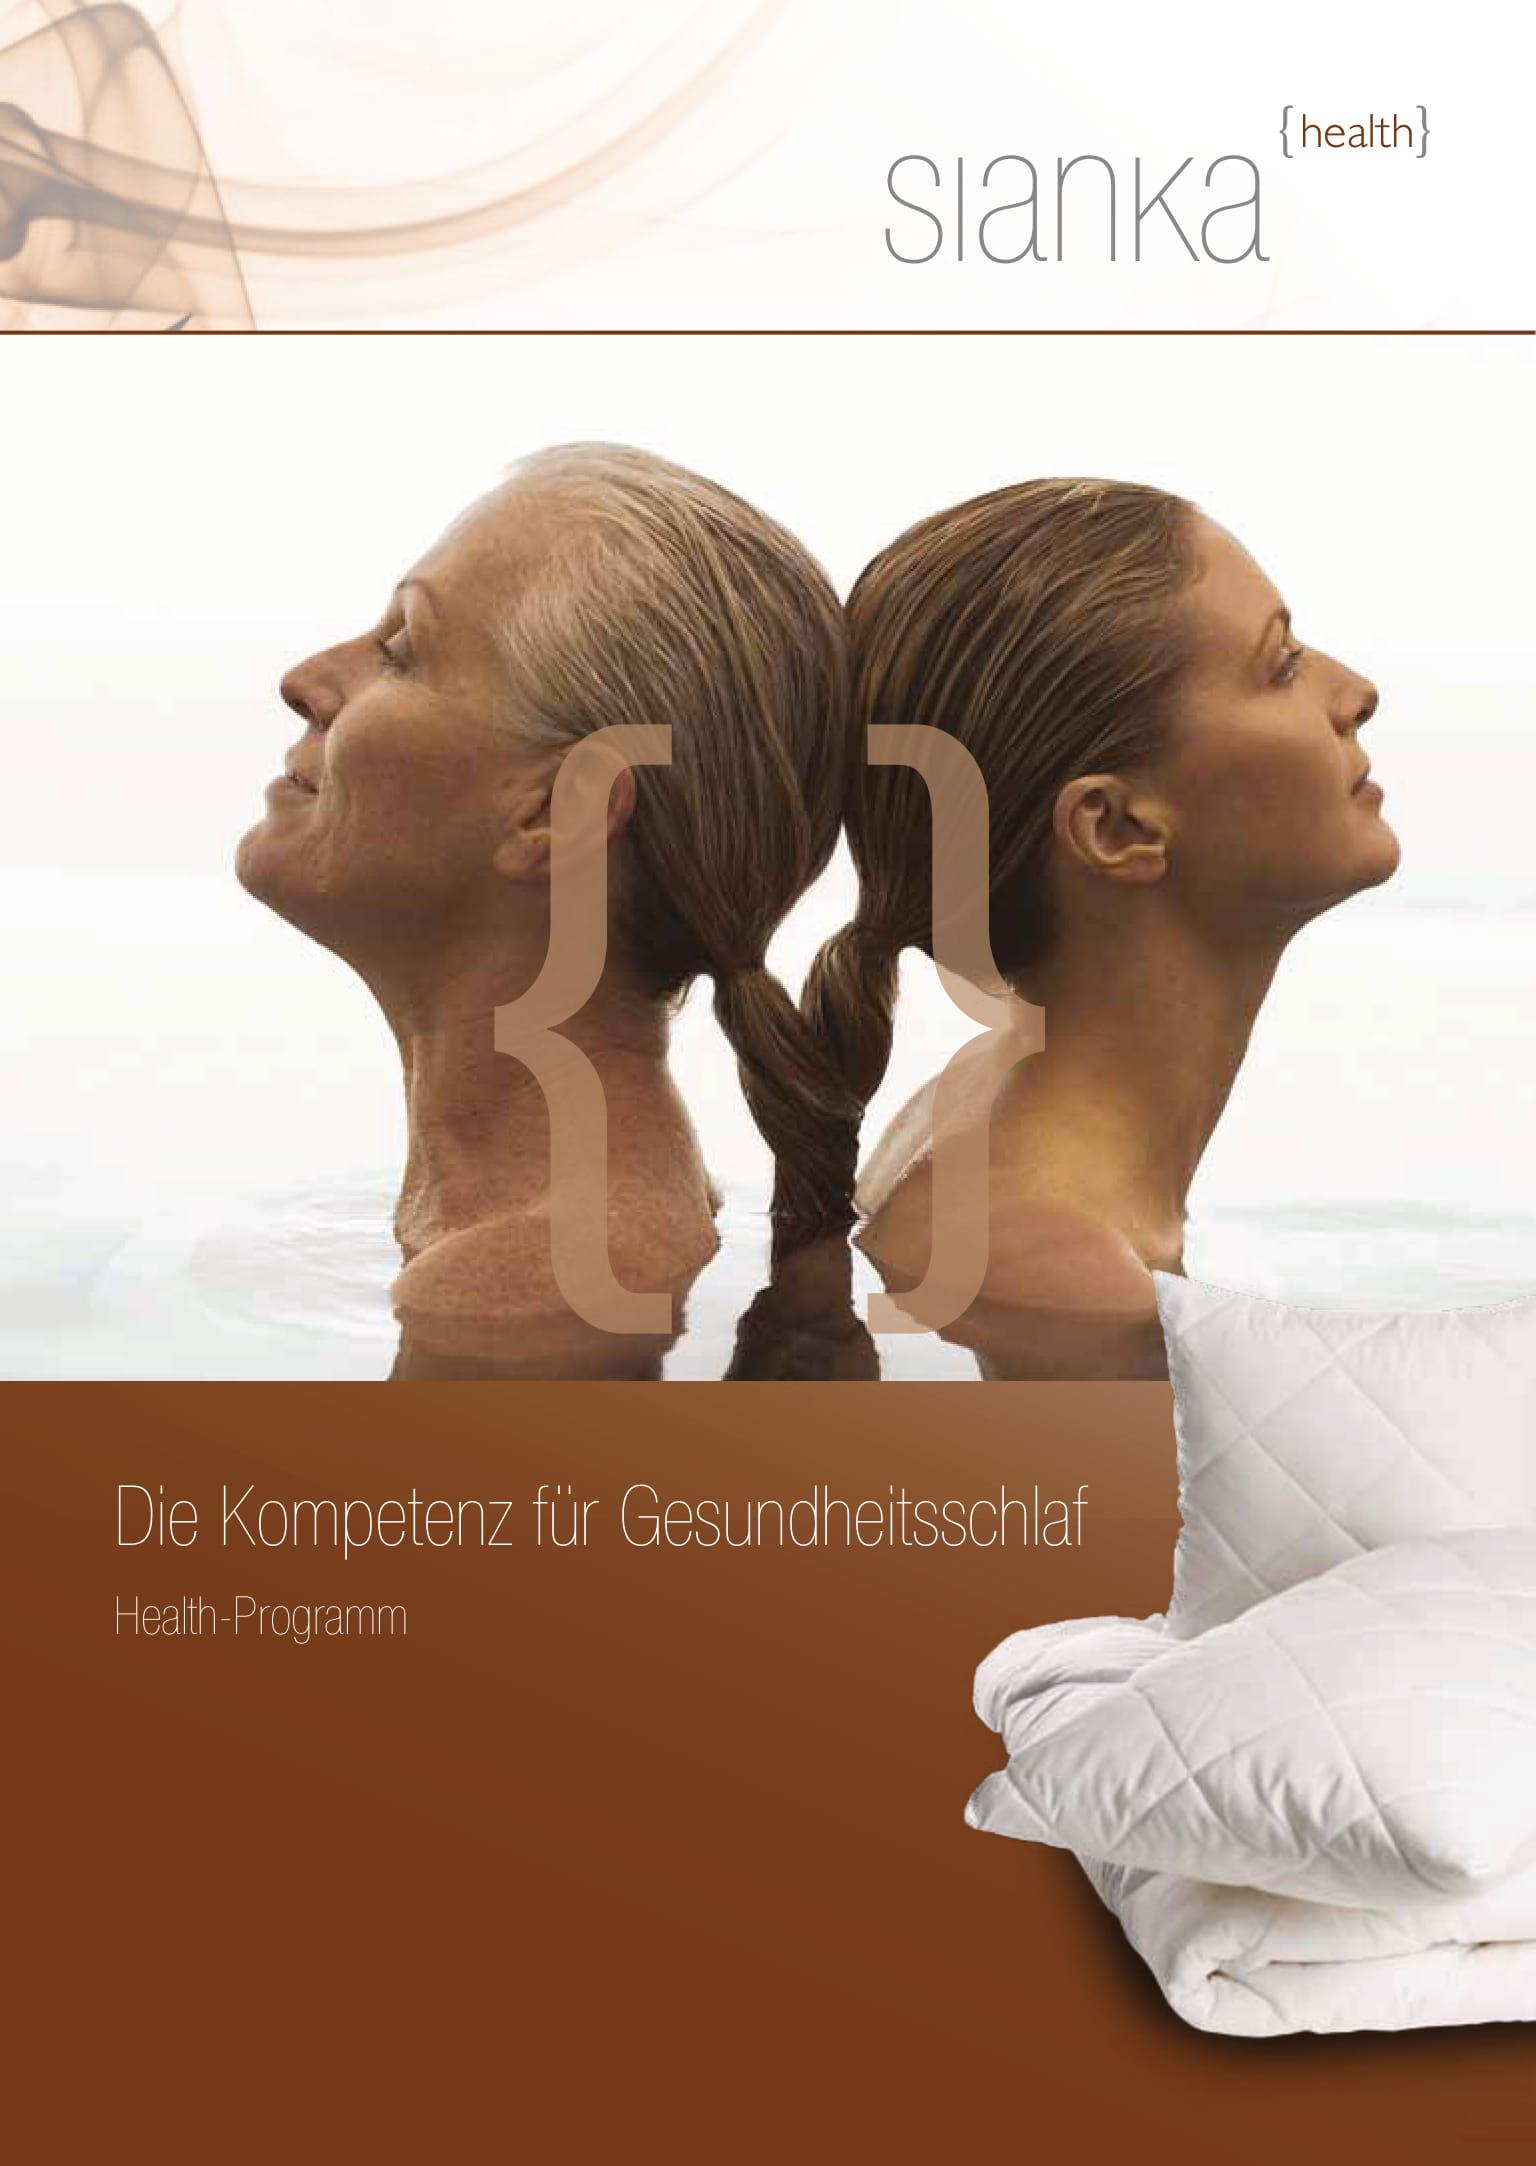 Sianka-Prospekt-Health-31-08-2012-Ansicht-1